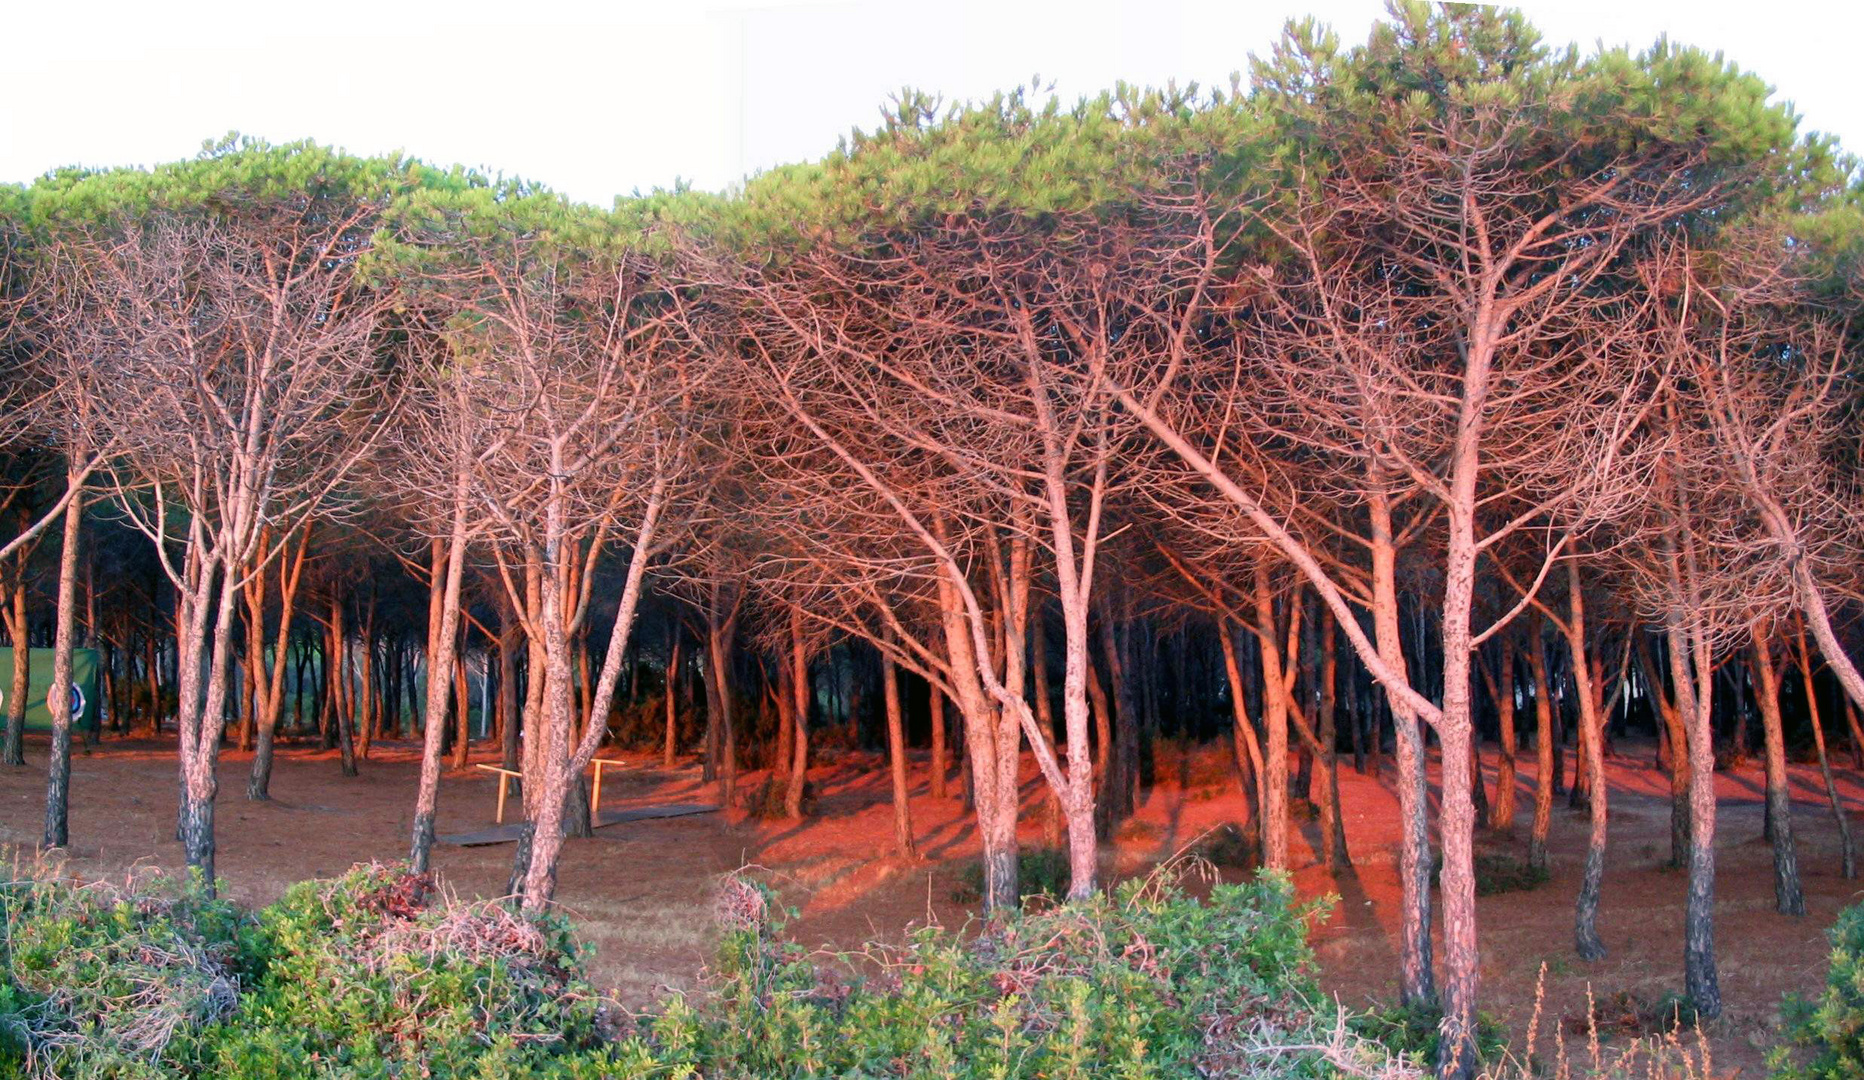 pinède au soleil levant, Sardaigne